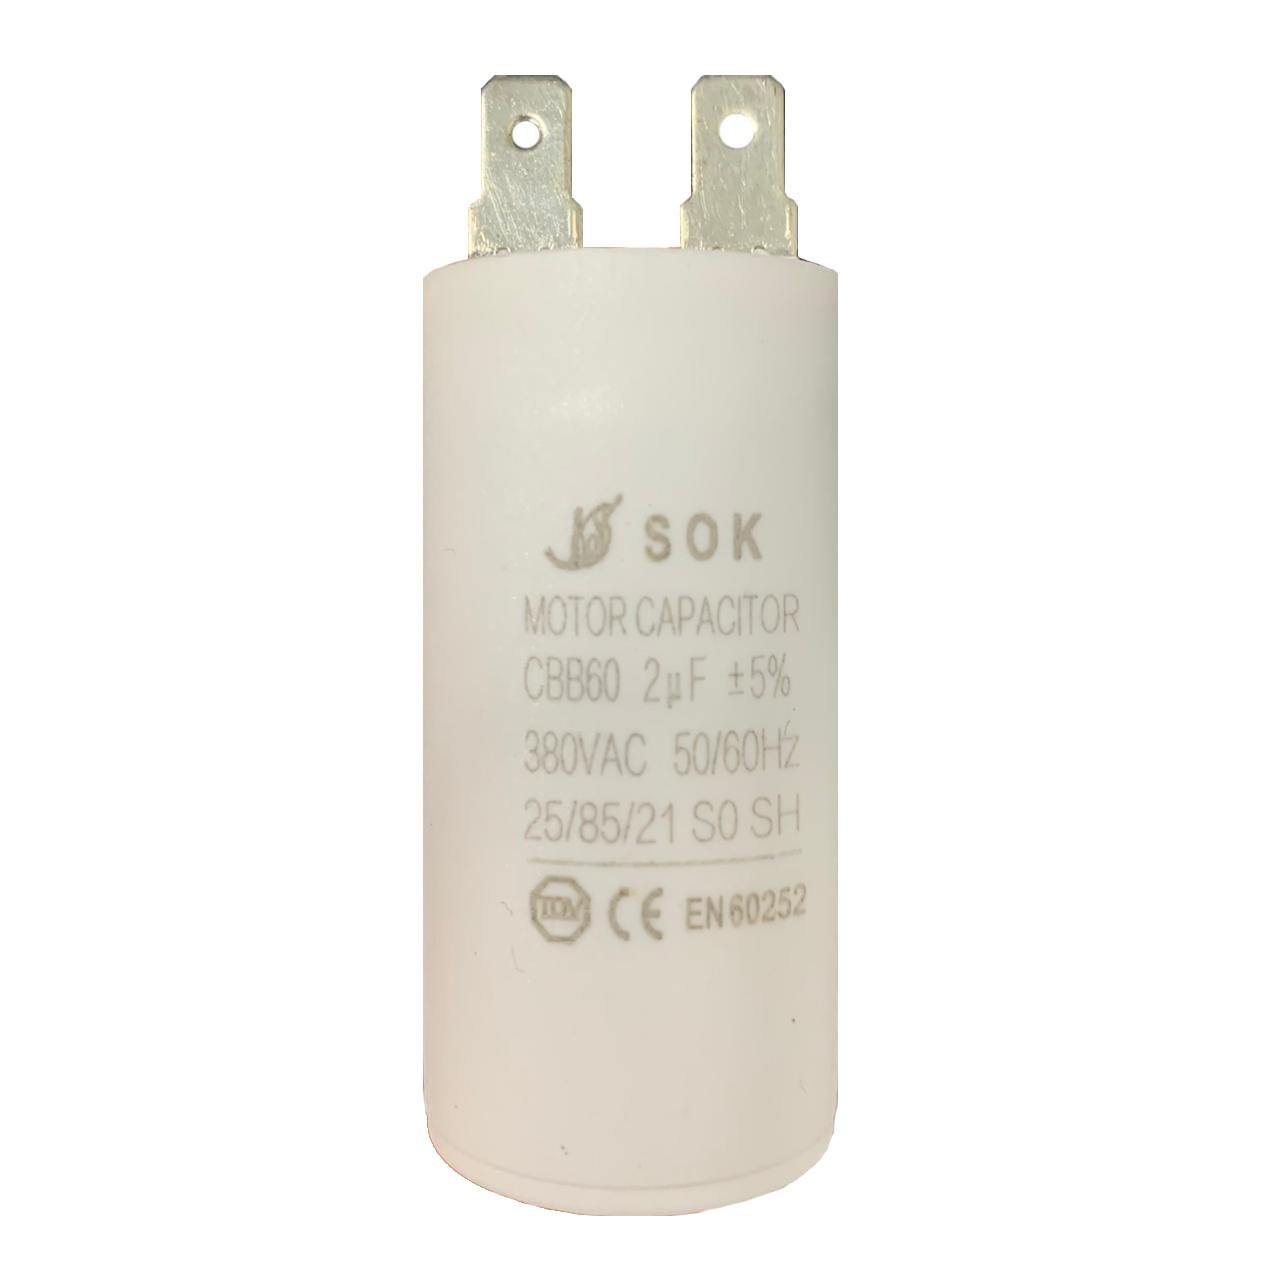 Capacitor 2uf +-5% MFD 380V 50/60Hz